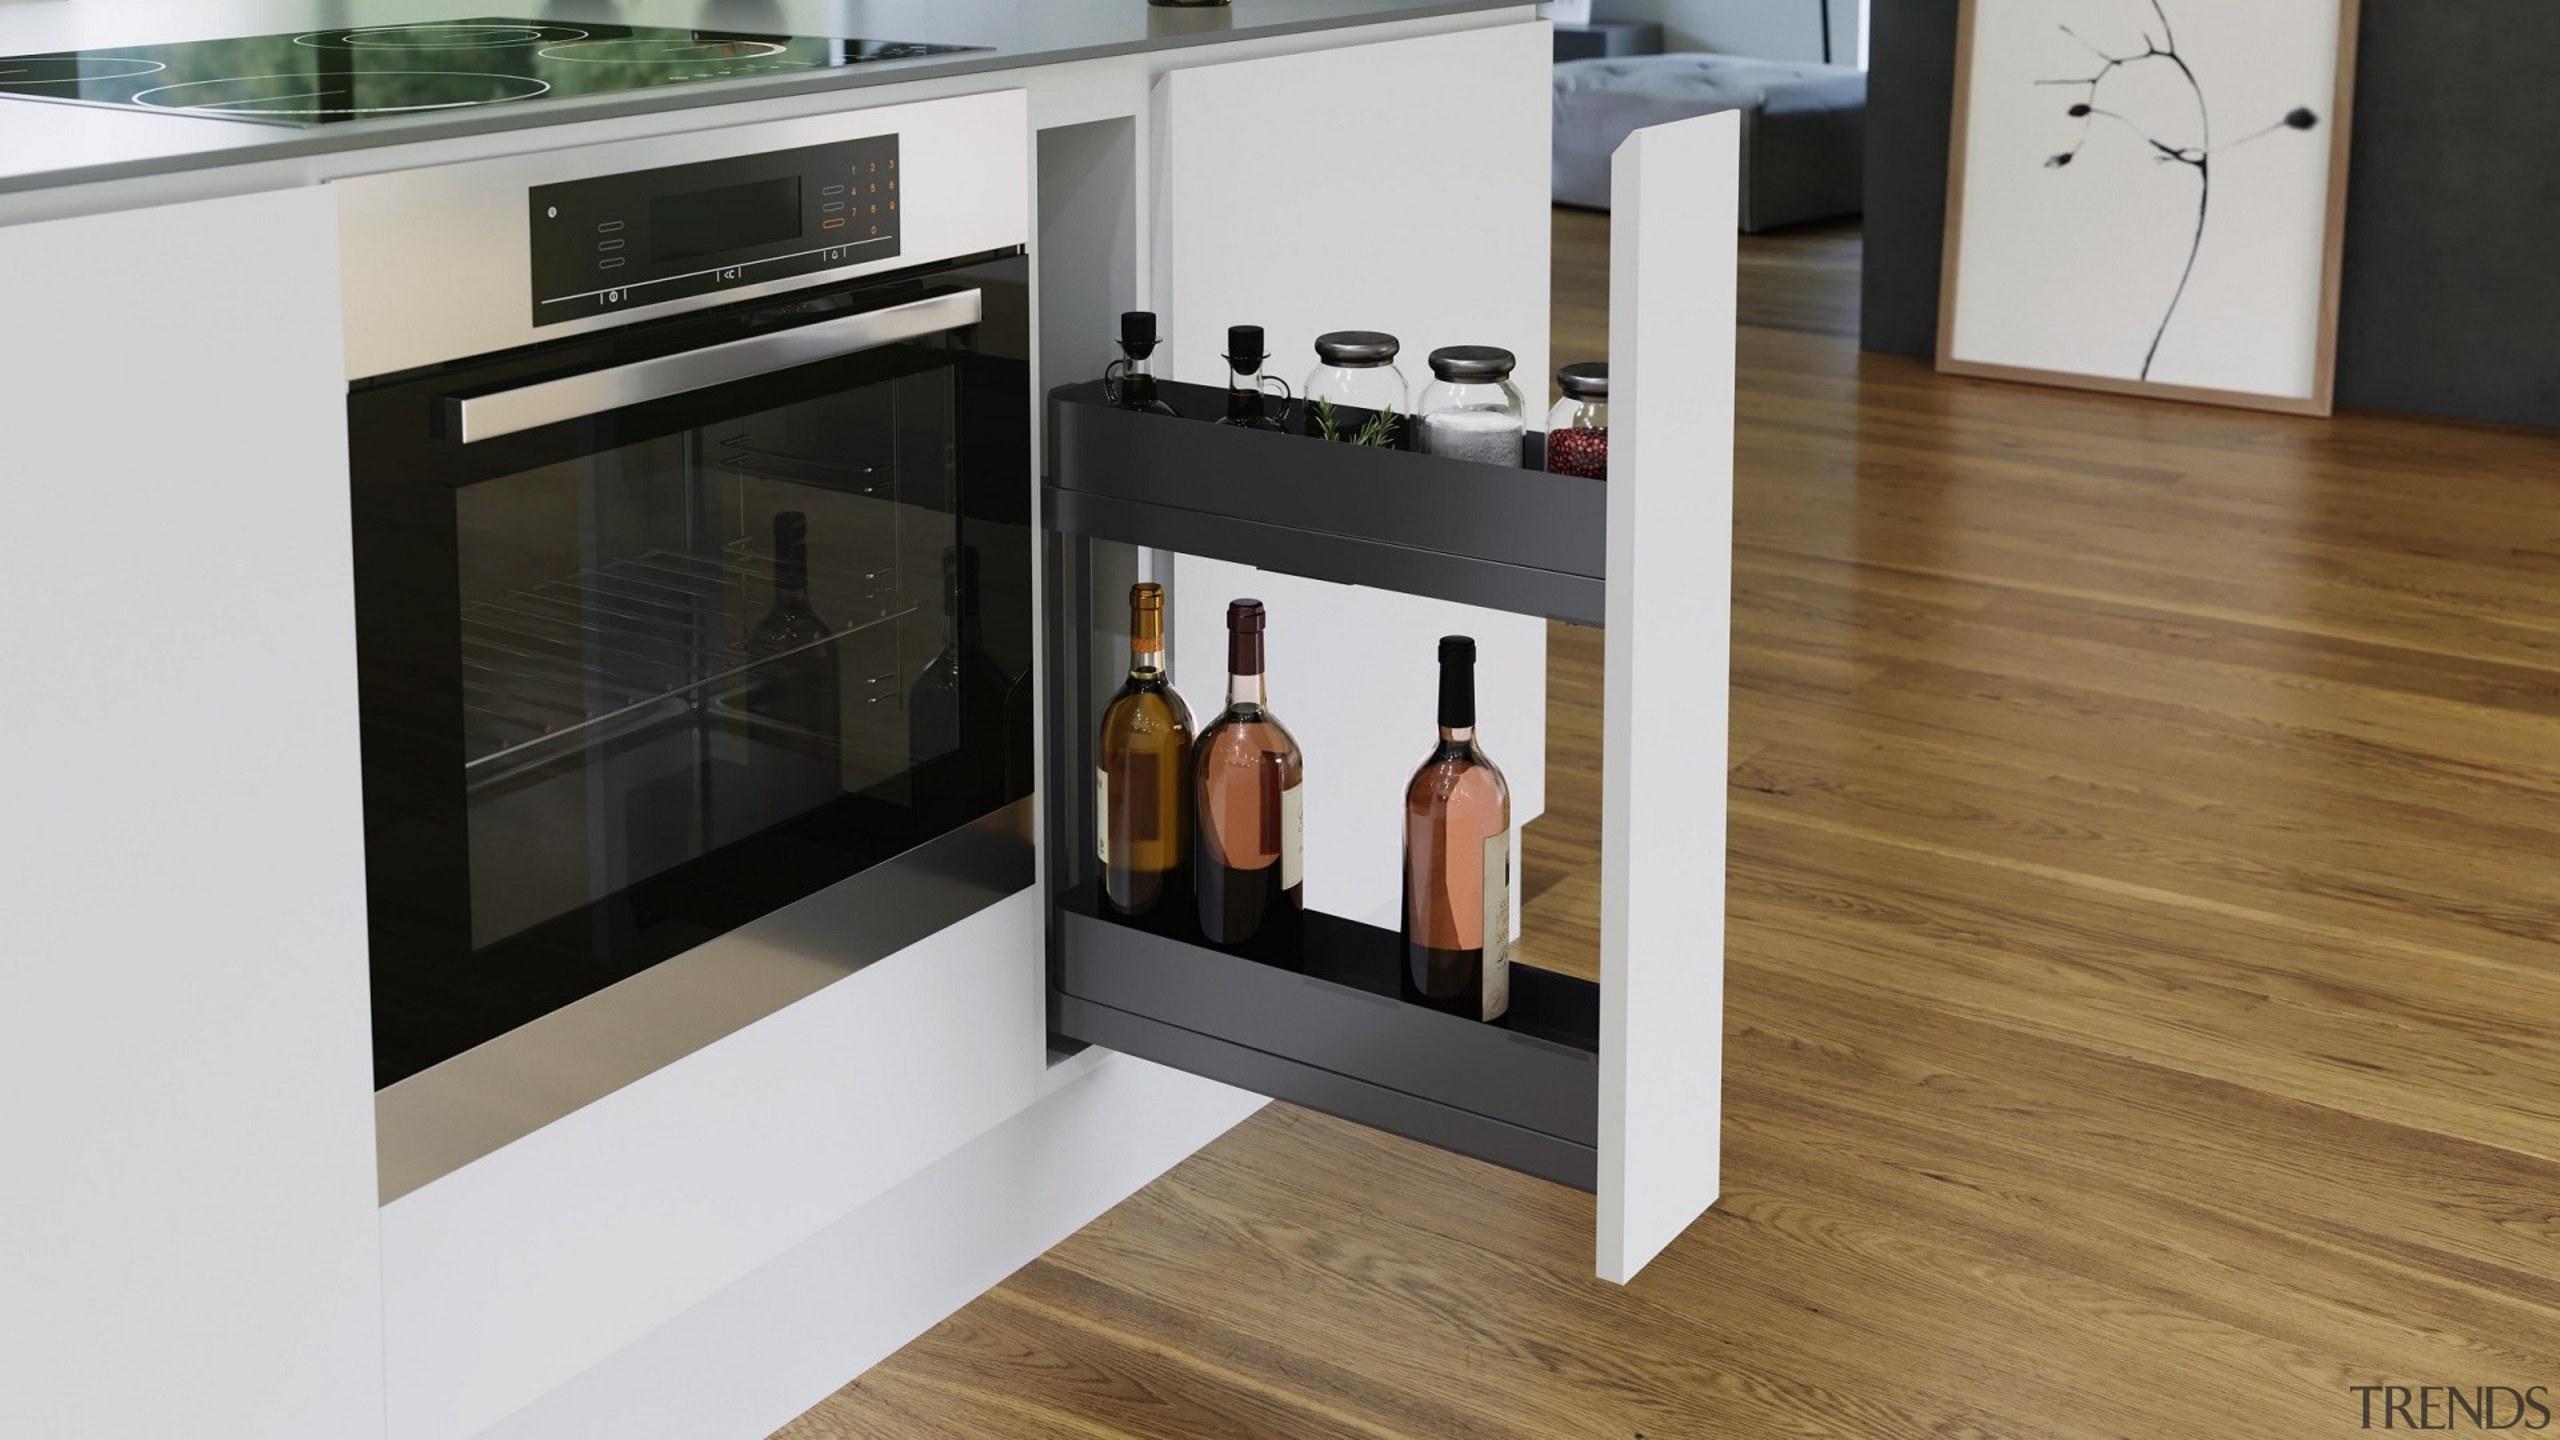 Vauth Sagel SUB Slim Underbench Pull Out Unit floor, flooring, furniture, home appliance, kitchen, kitchen appliance, kitchen stove, product, white, brown